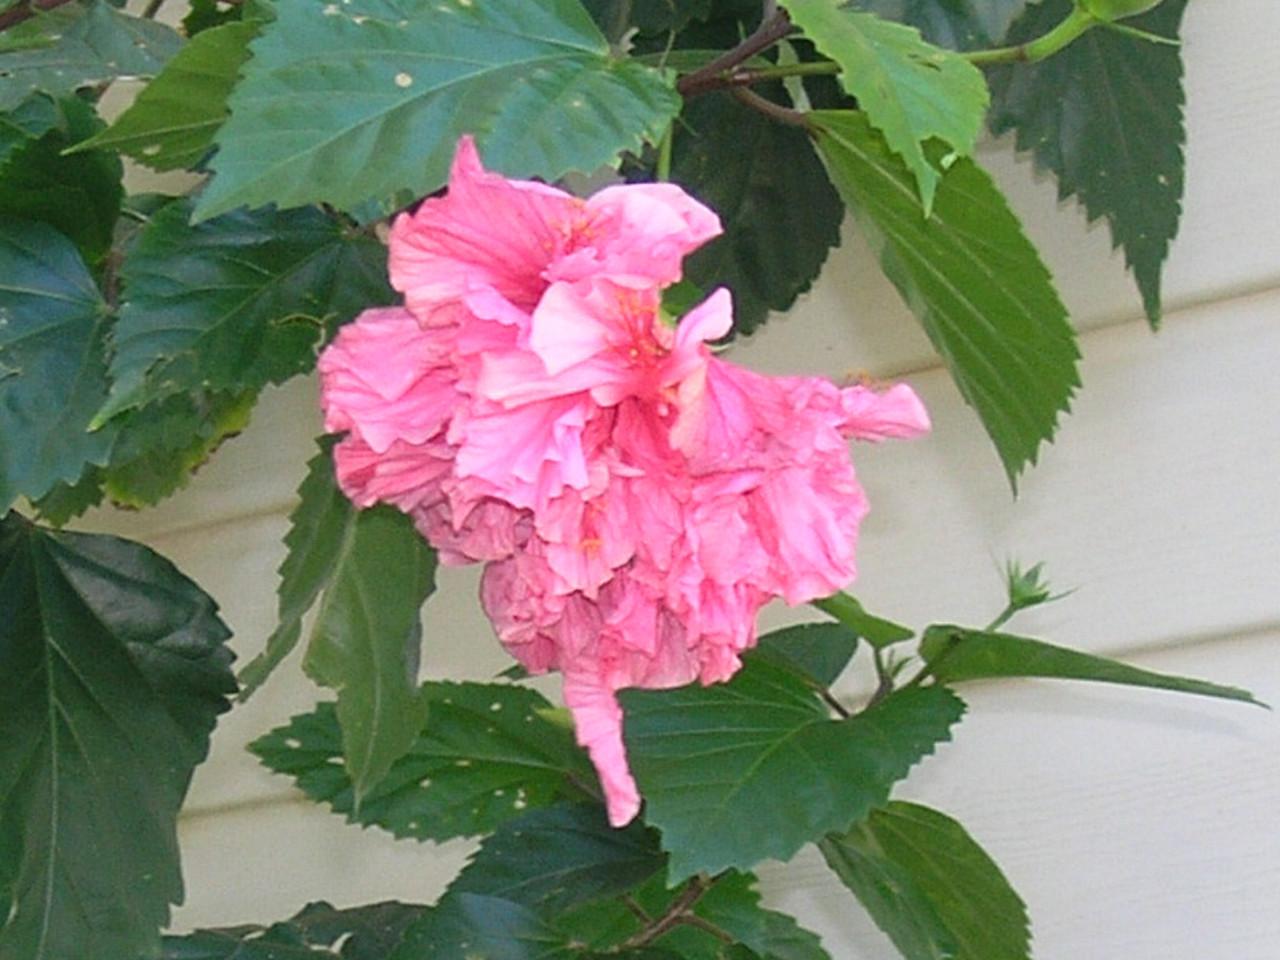 Flower from Holly's Mum's garden